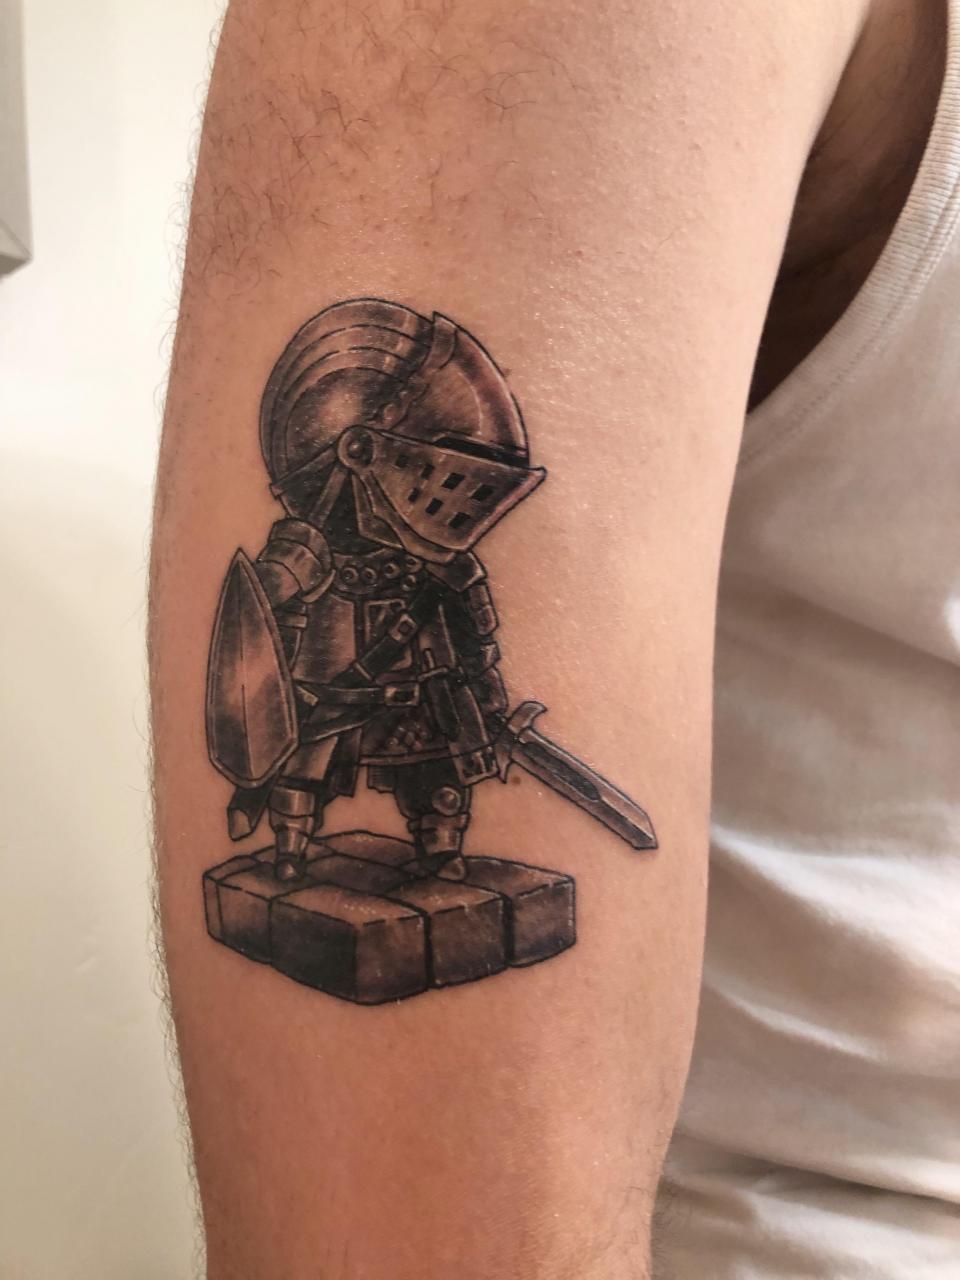 Dark Souls Elite Knight on my right arm by Pete. Talon Tattoo in Boise Idaho